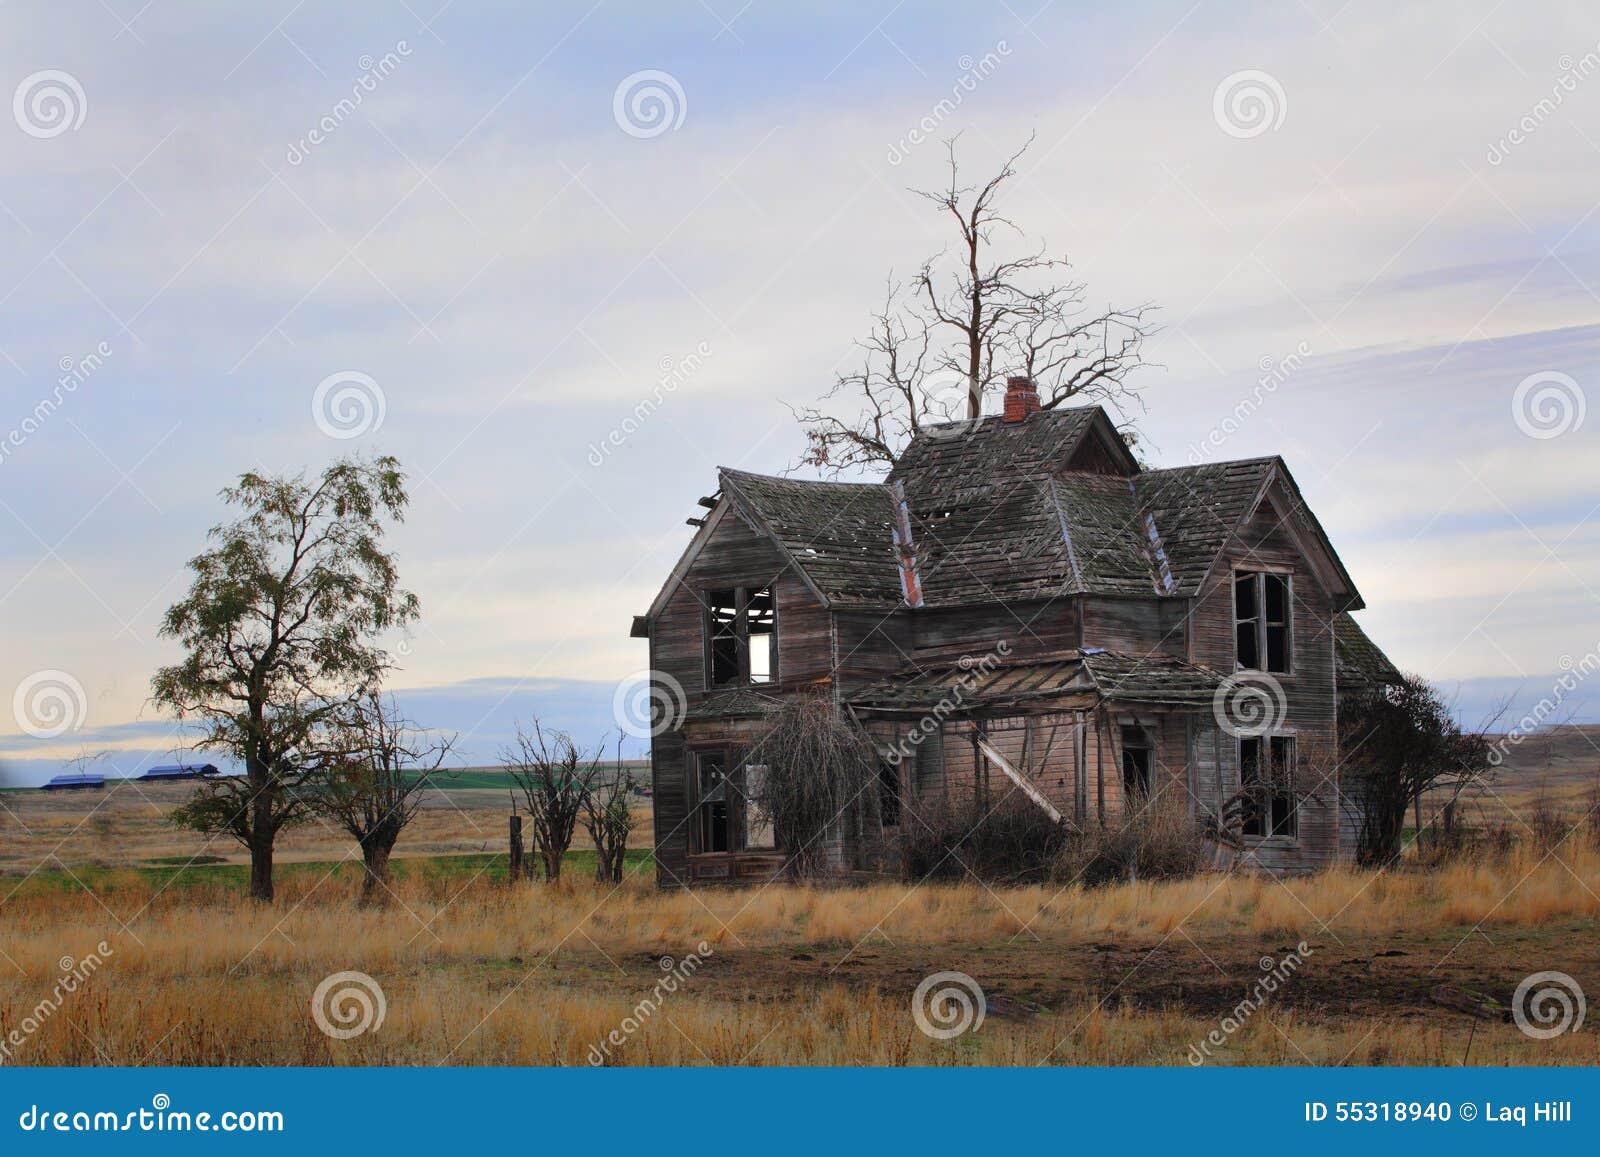 Old Frontier Homestead